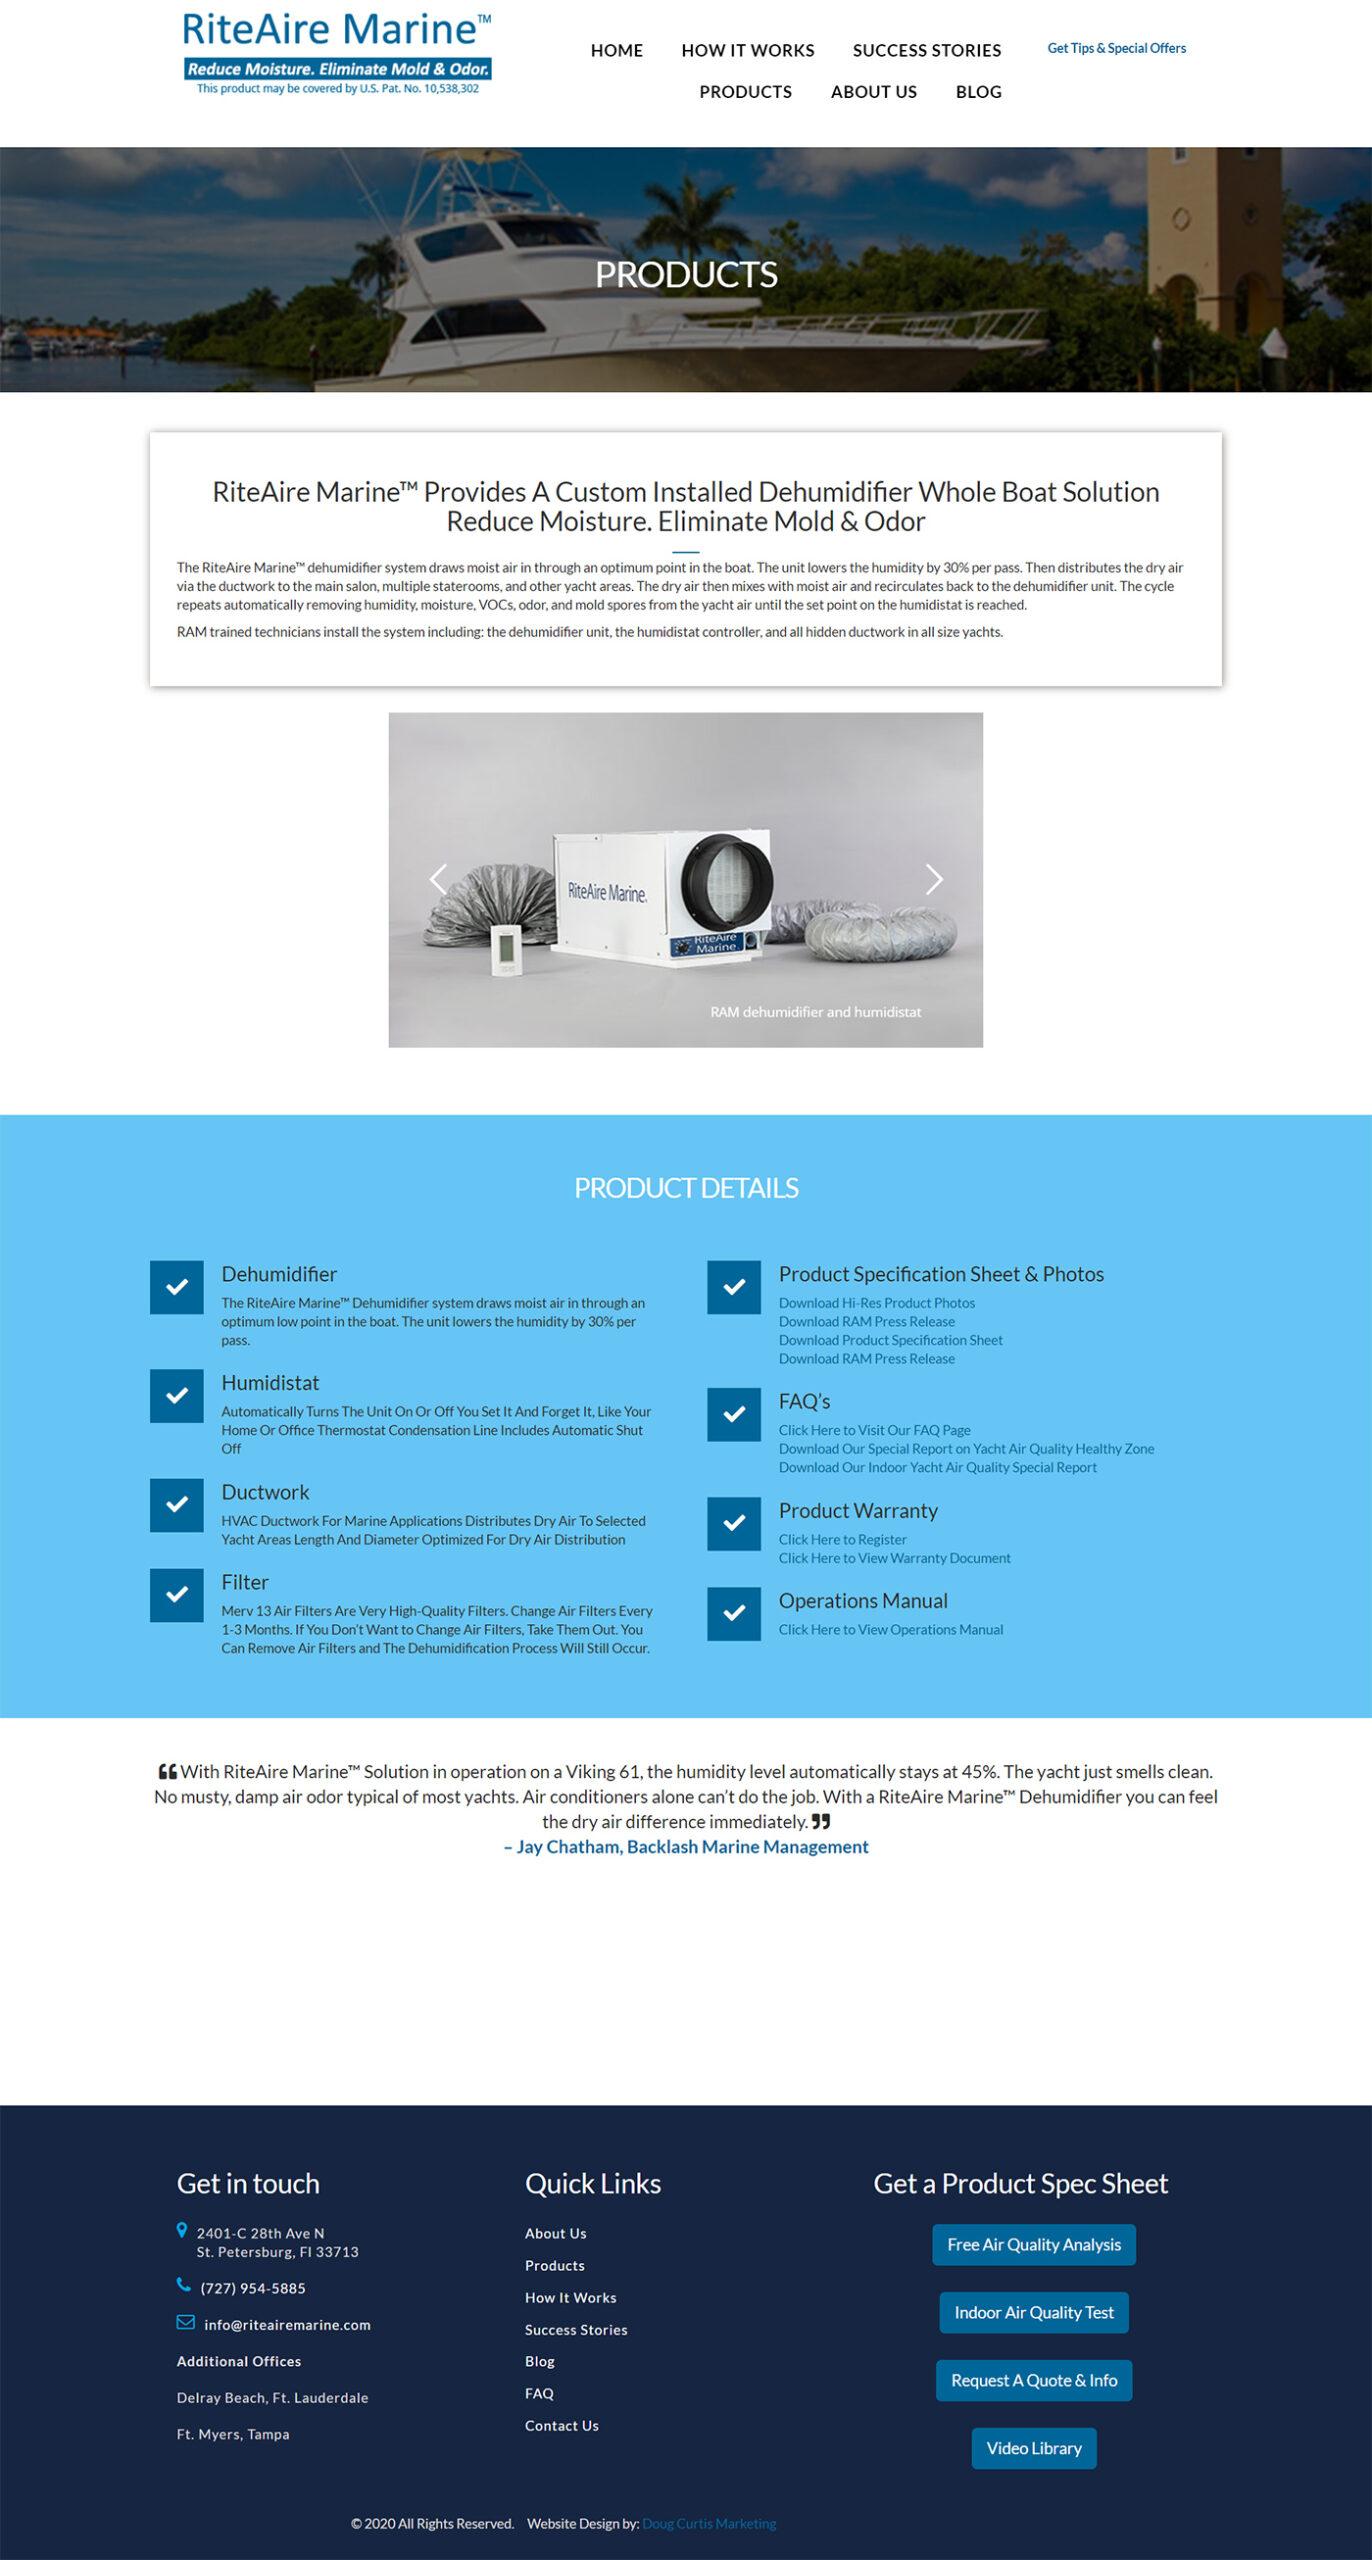 screencapture-riteairemarine-products-2021-02-28-10_28_57